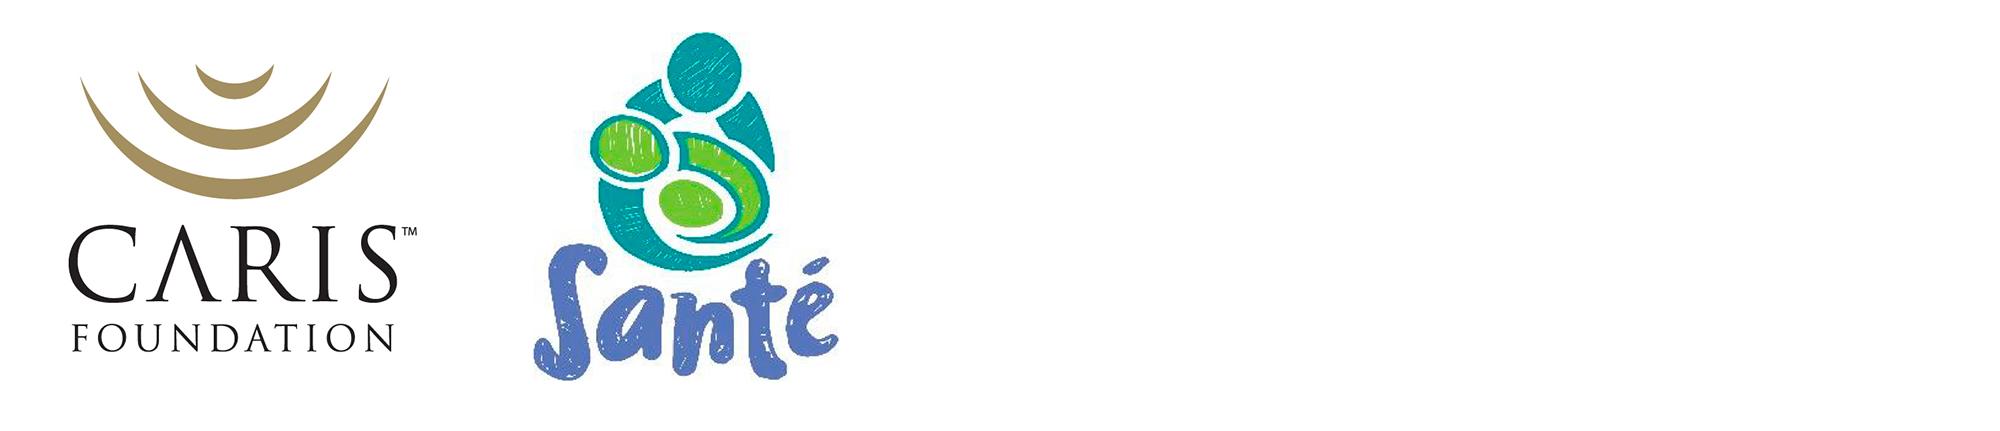 CF_Sante_logos.jpg